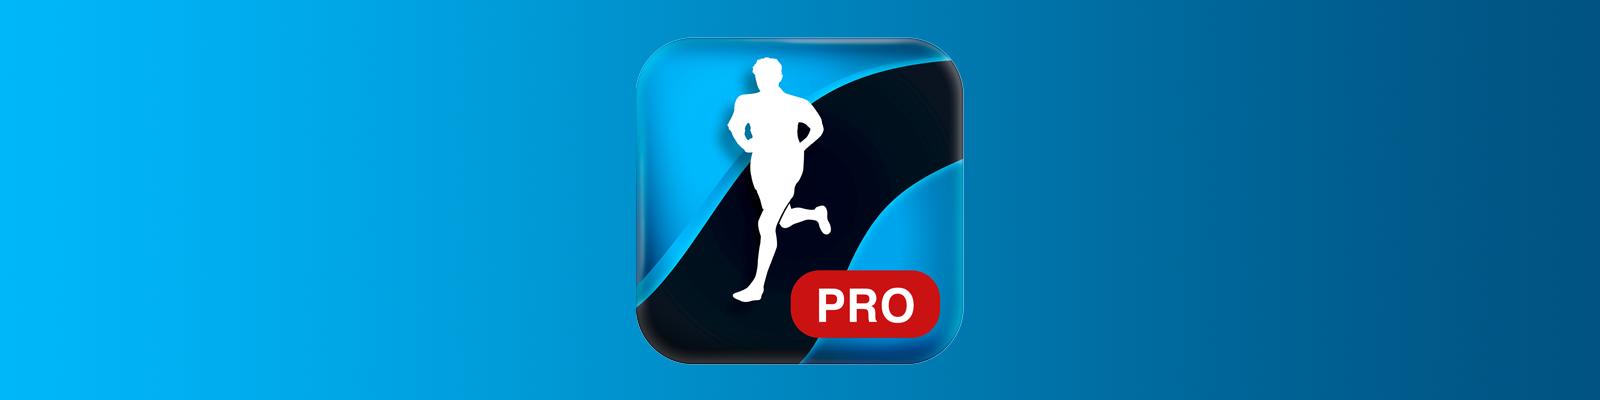 runtastic pro app development